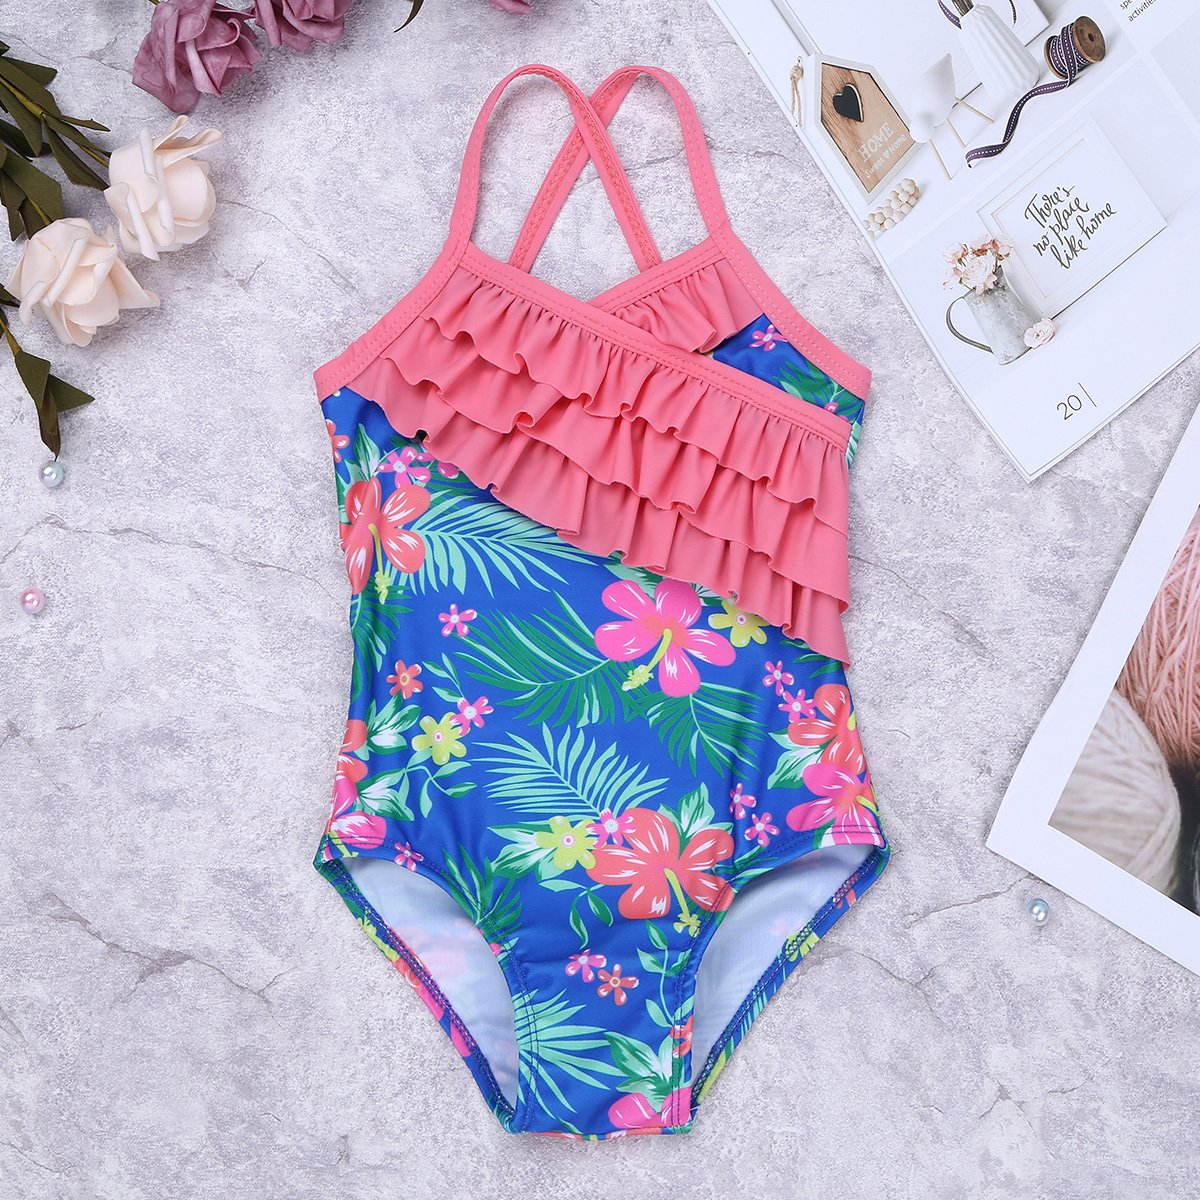 dPois Kids Girls One-Piece Floral Printed Ruffles Swimsuit Swimwear Criss Cross Back Bathing Suit